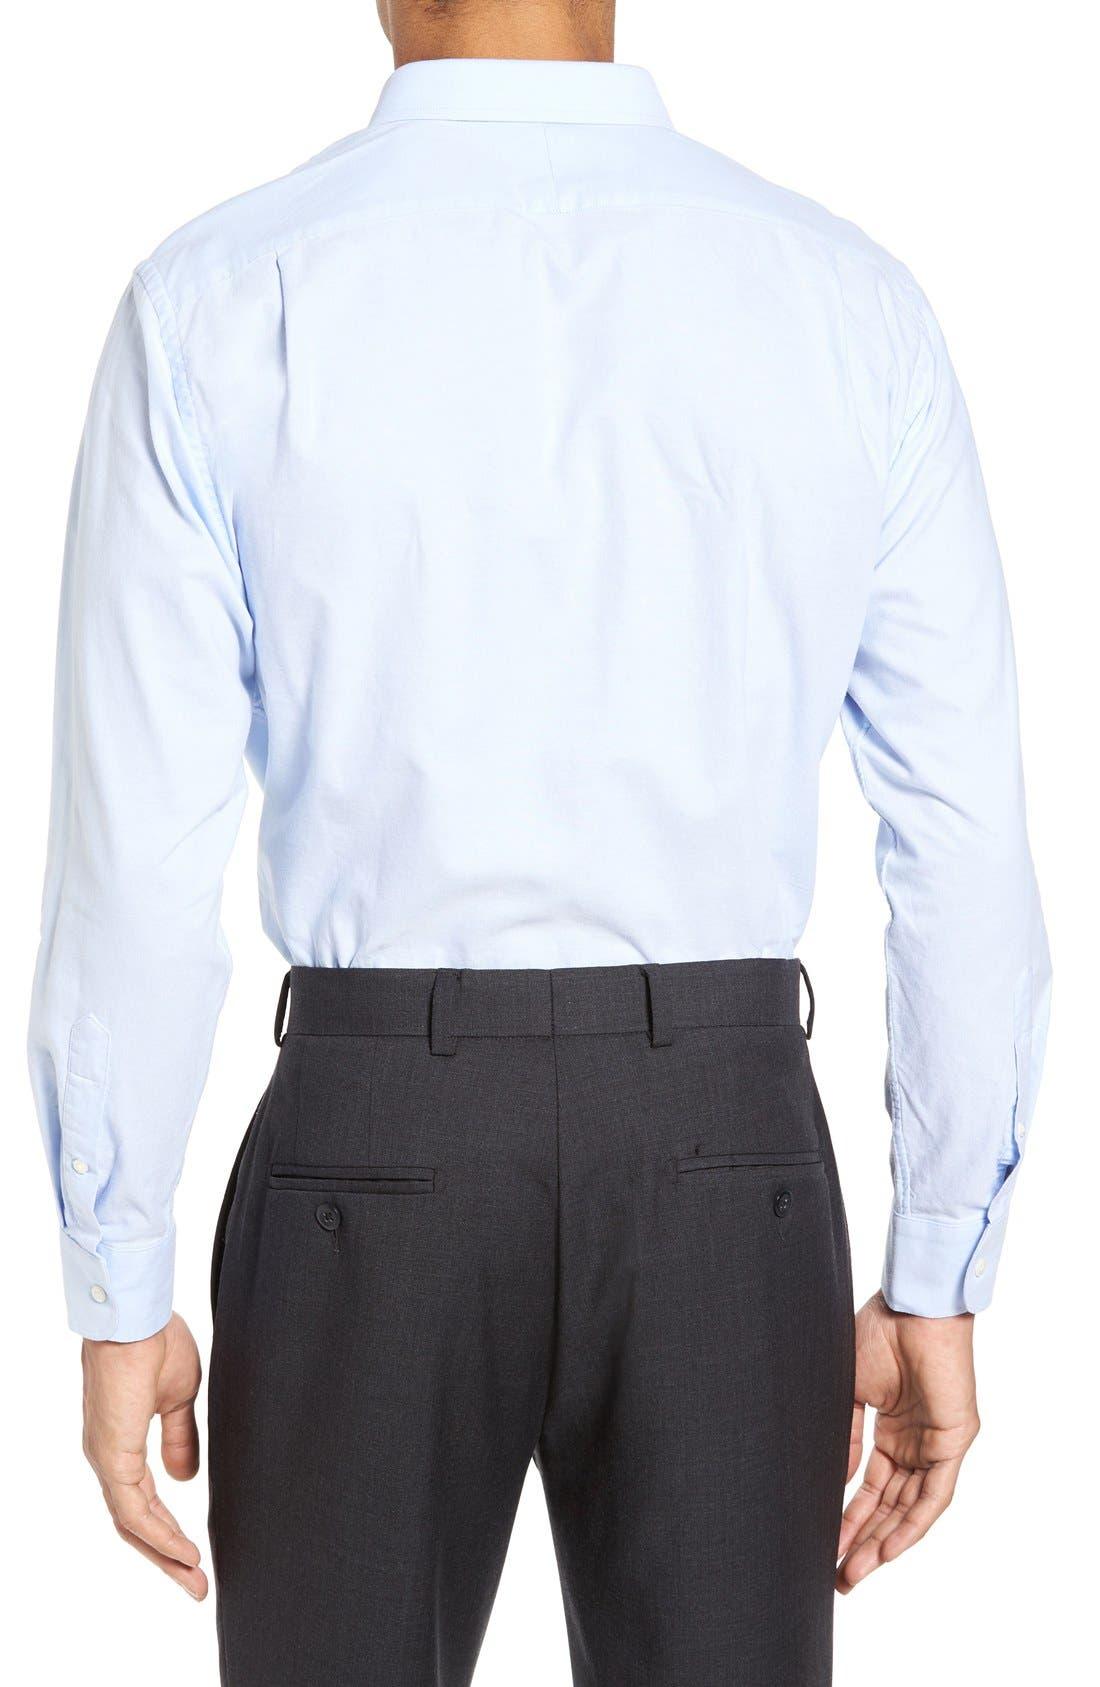 Trim Fit Solid Oxford Dress Shirt,                             Alternate thumbnail 10, color,